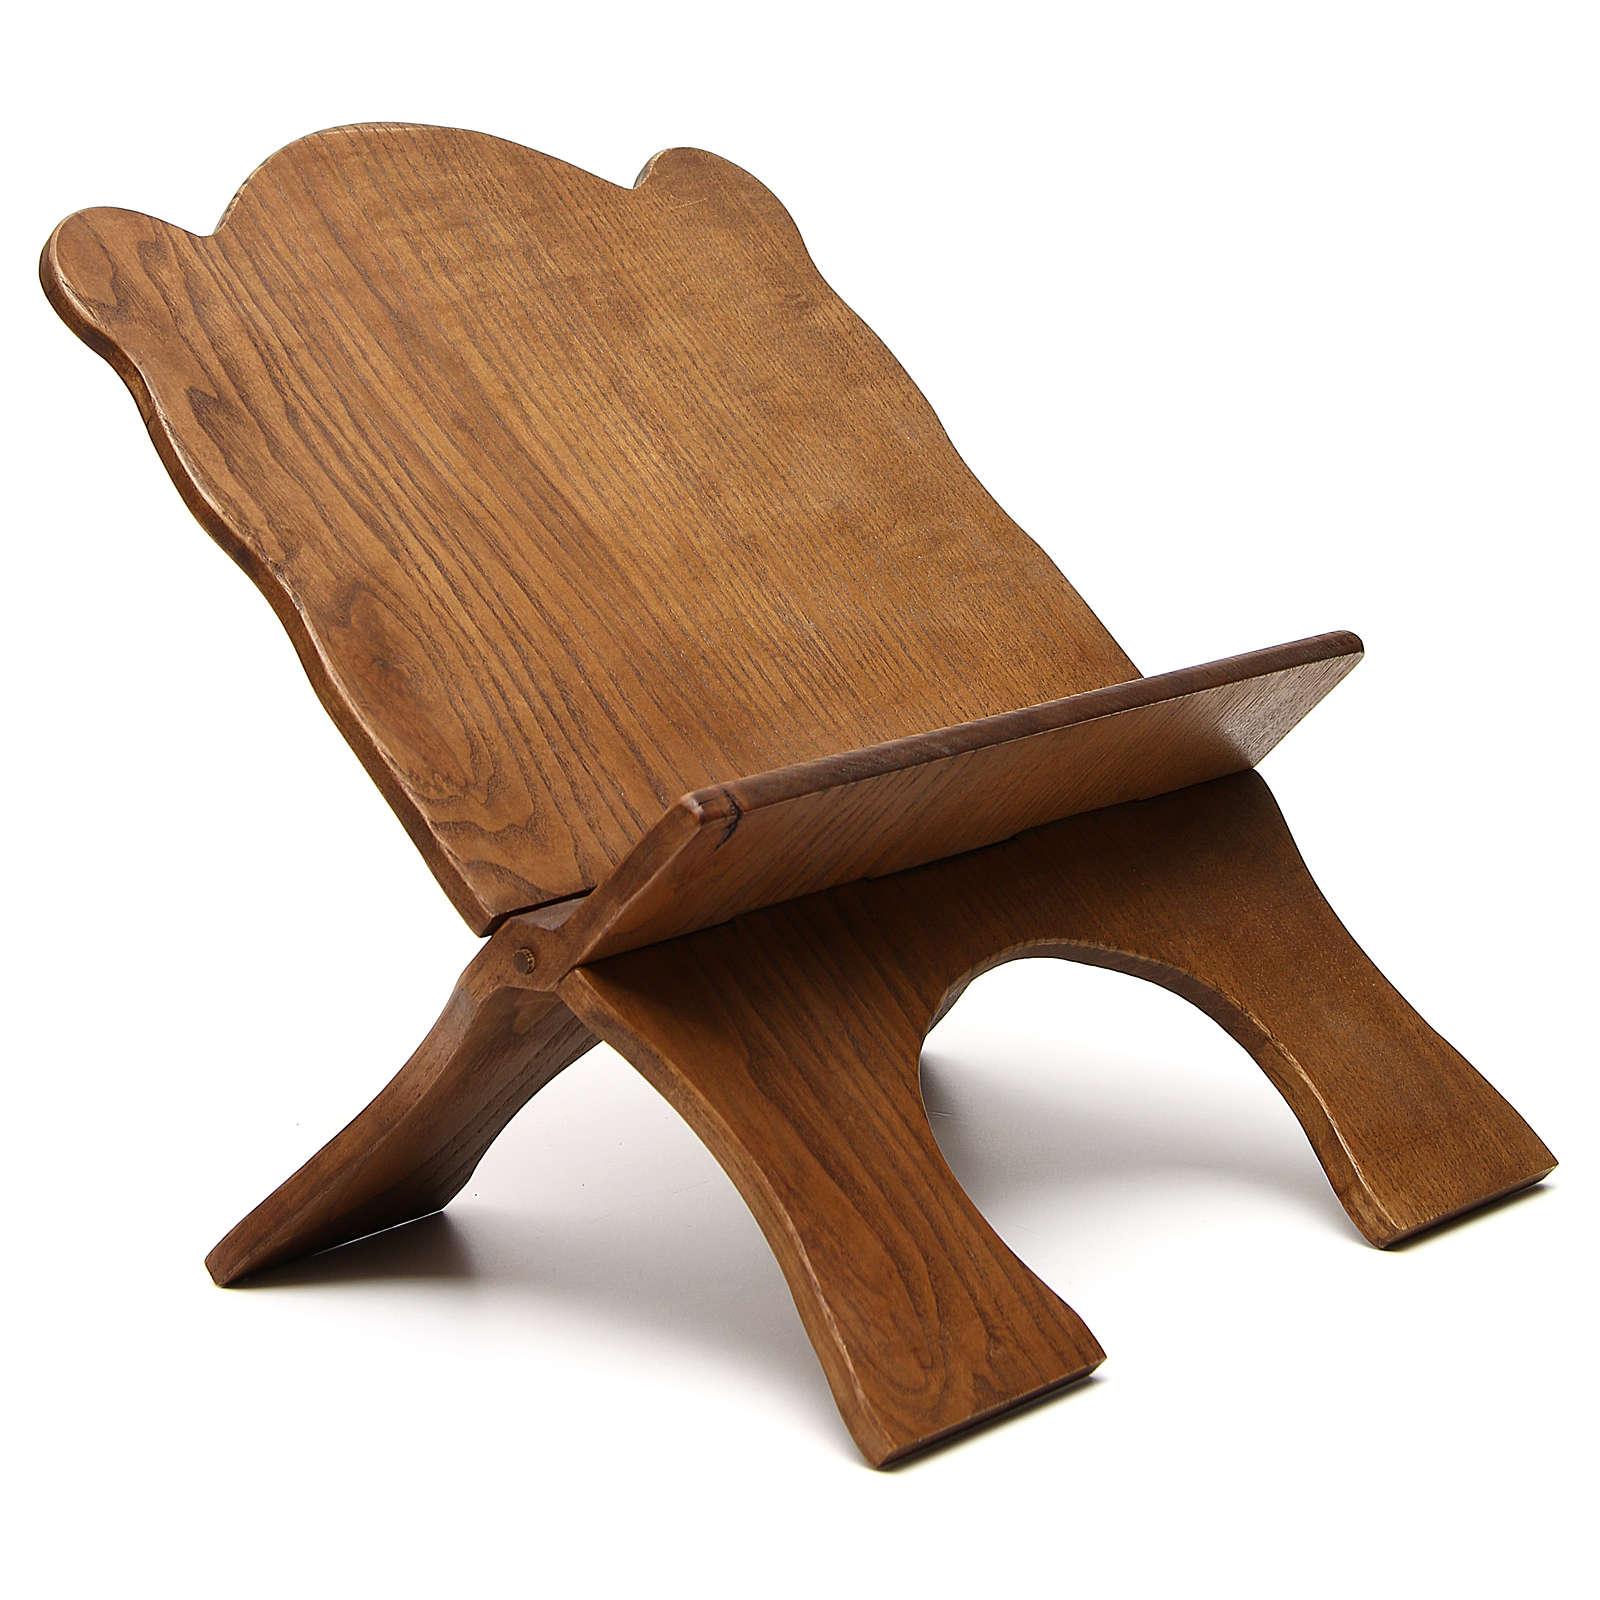 Atril de mesa madera de fresno oscuro Monjes de Belén 4